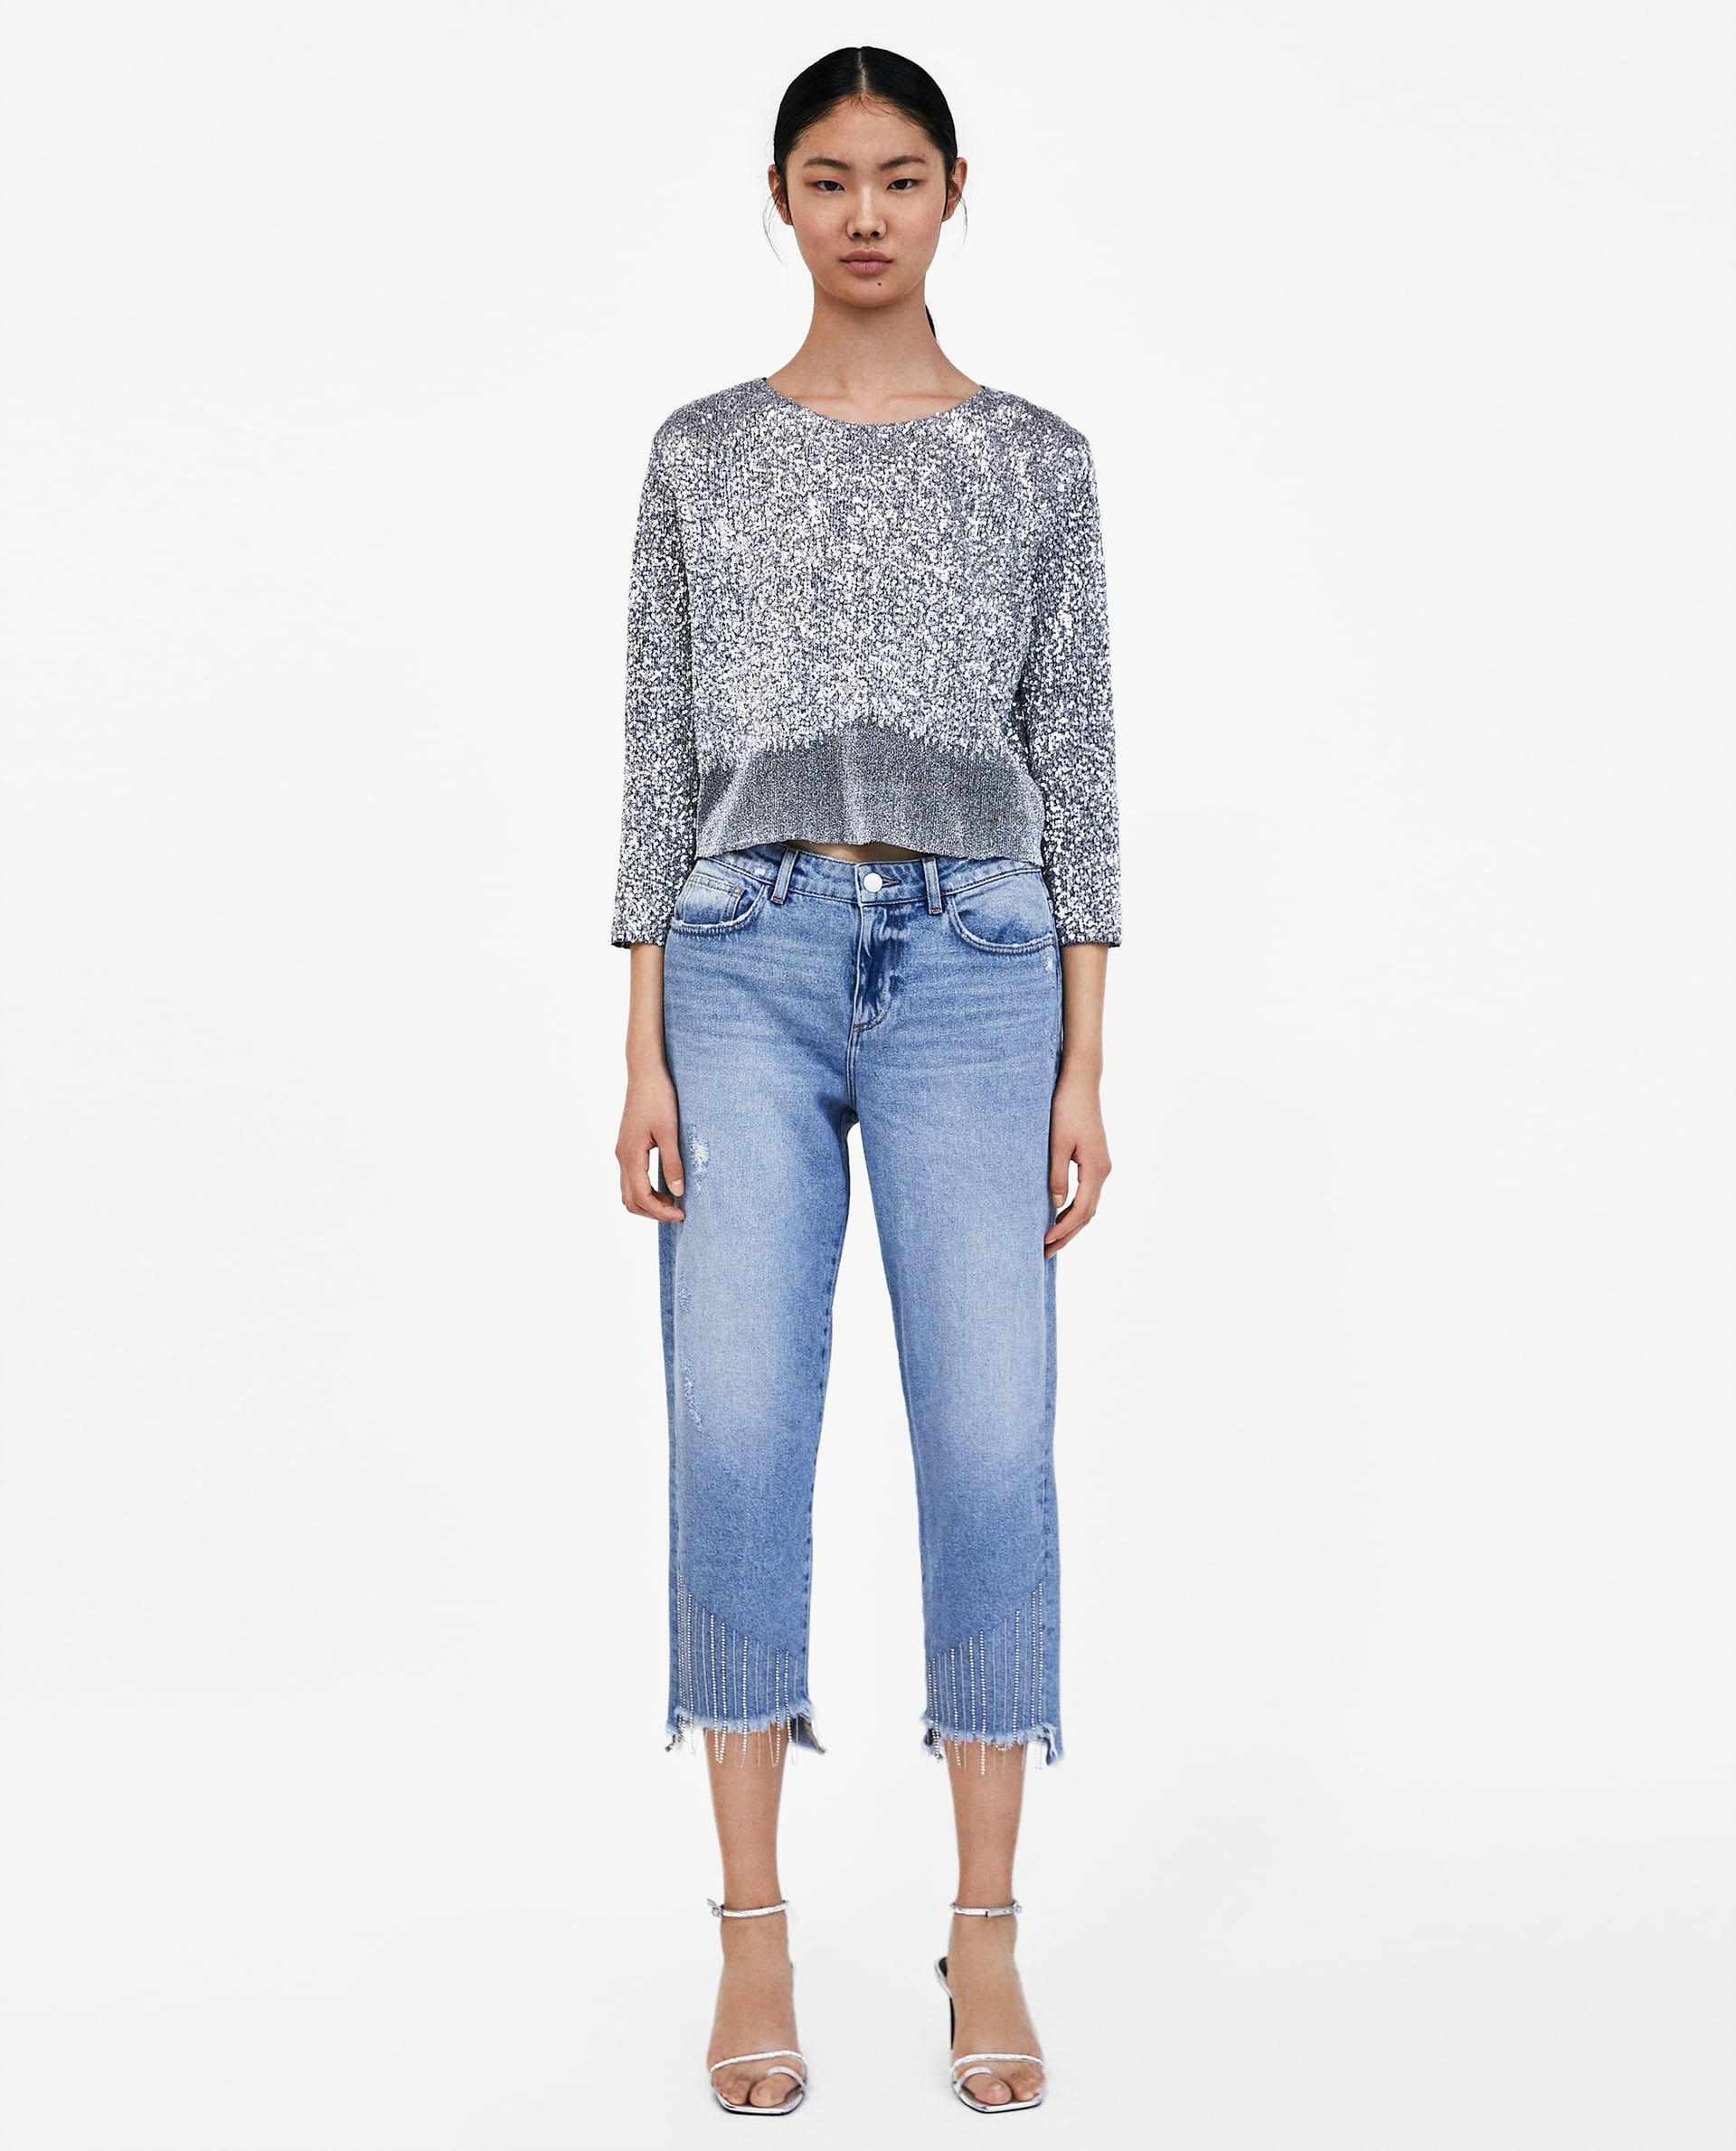 7e5b0e84f8 Tie-dye z1975 skinny jeans in 2019 | ZARA 2018 | Jeans, Jeans with ...